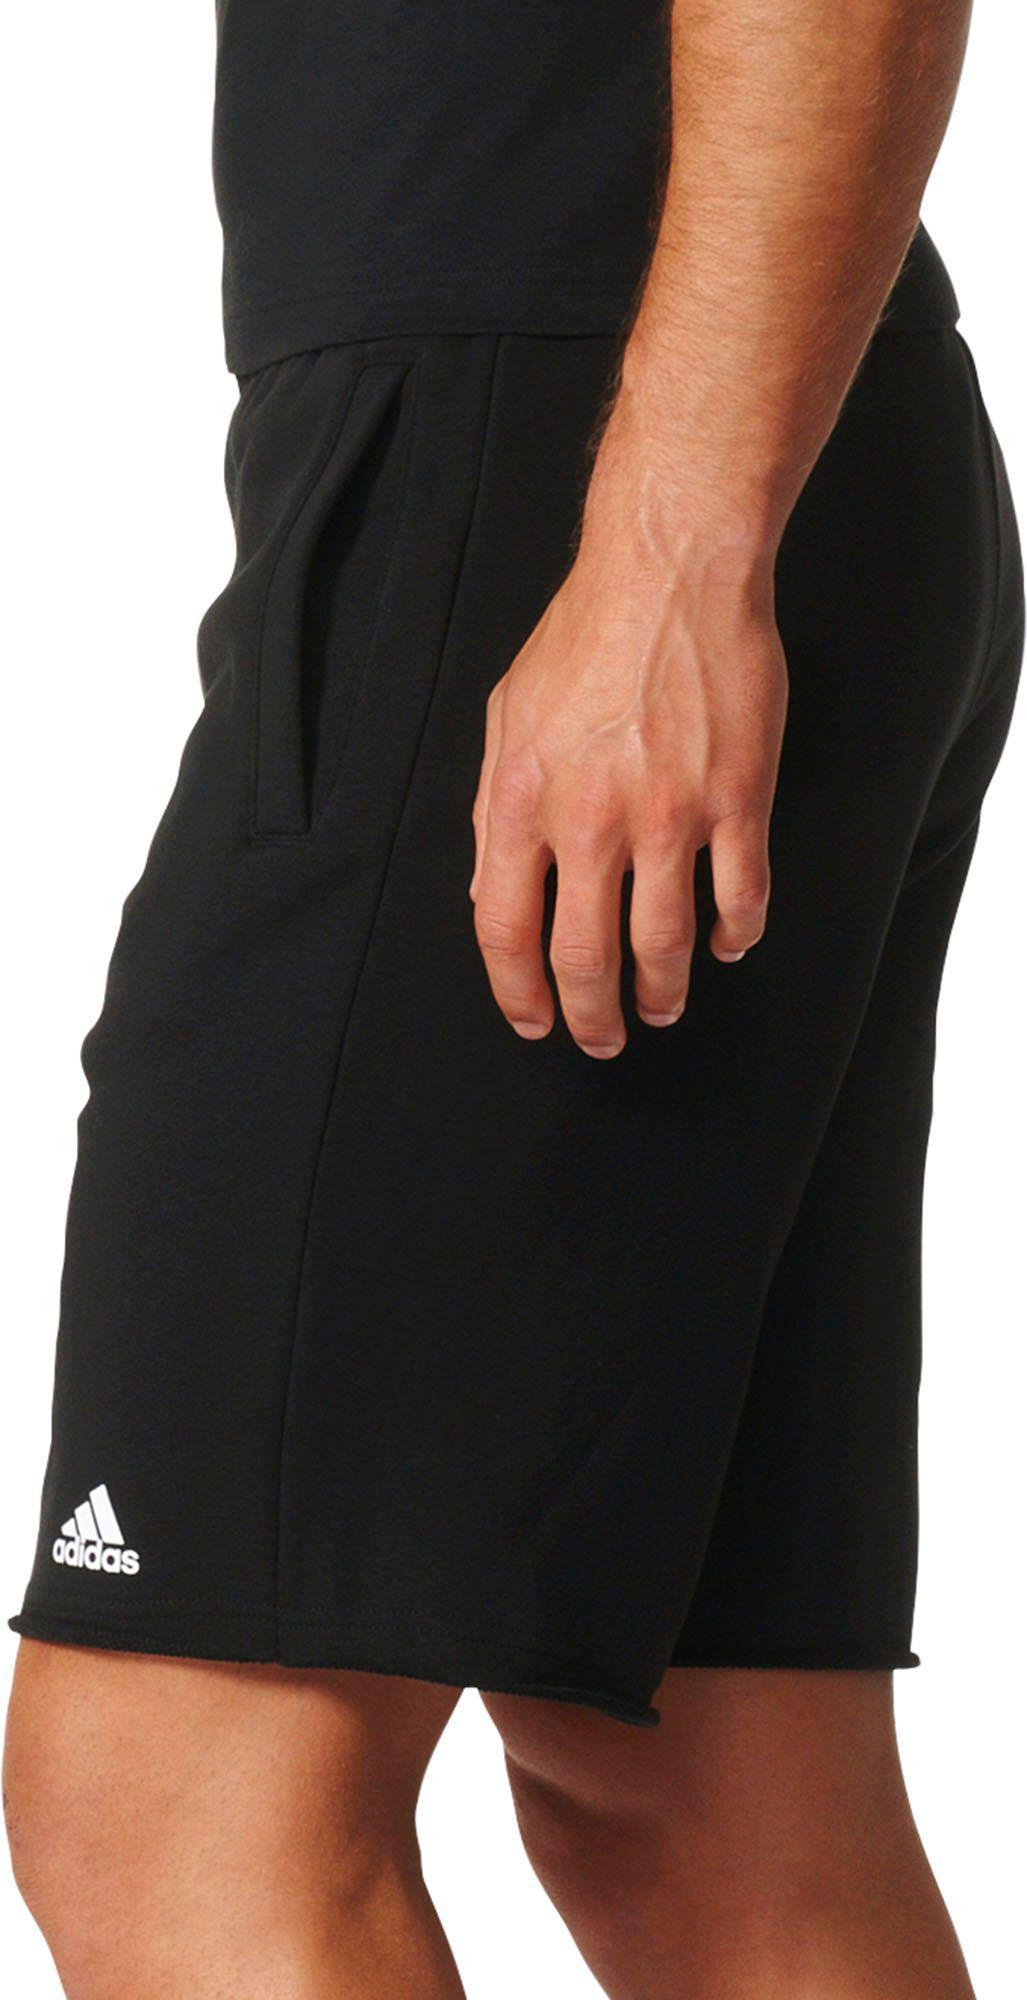 d07d05a010 Adidas Black Essentials Raw-edged Sweat Shorts for men